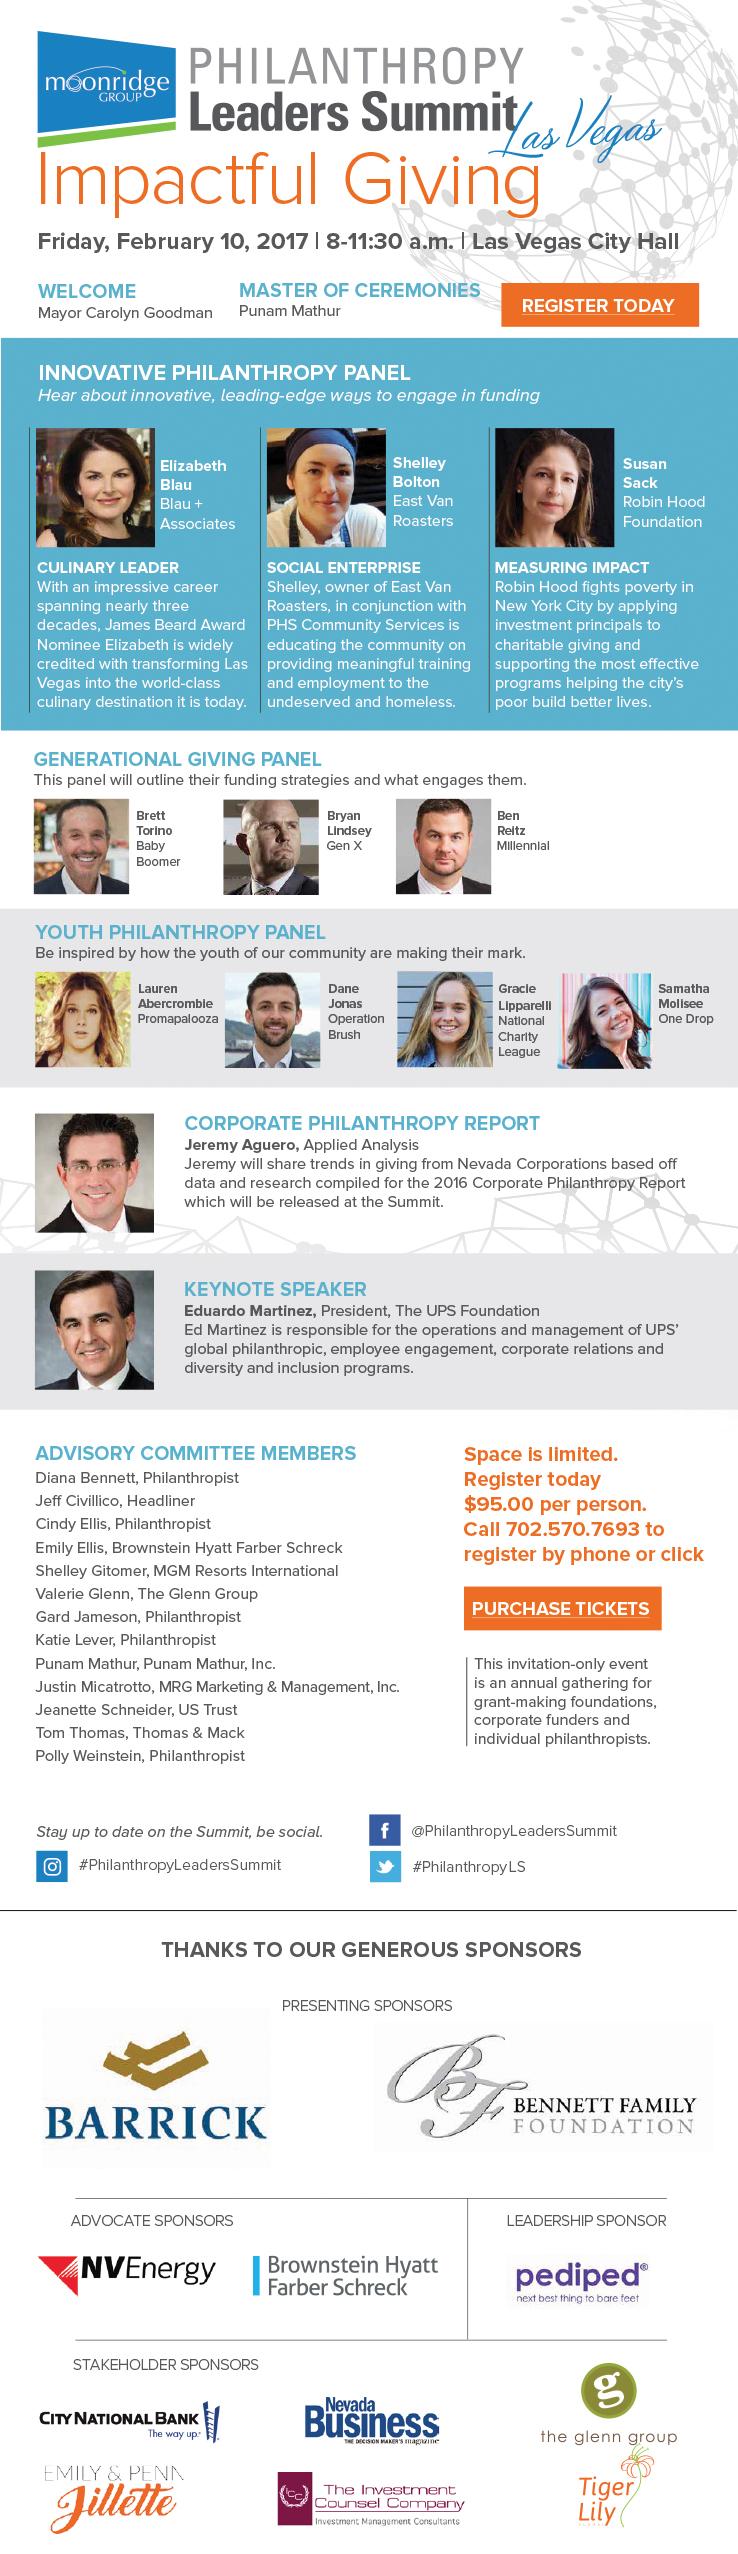 Philanthropy Leaders Summit 2017